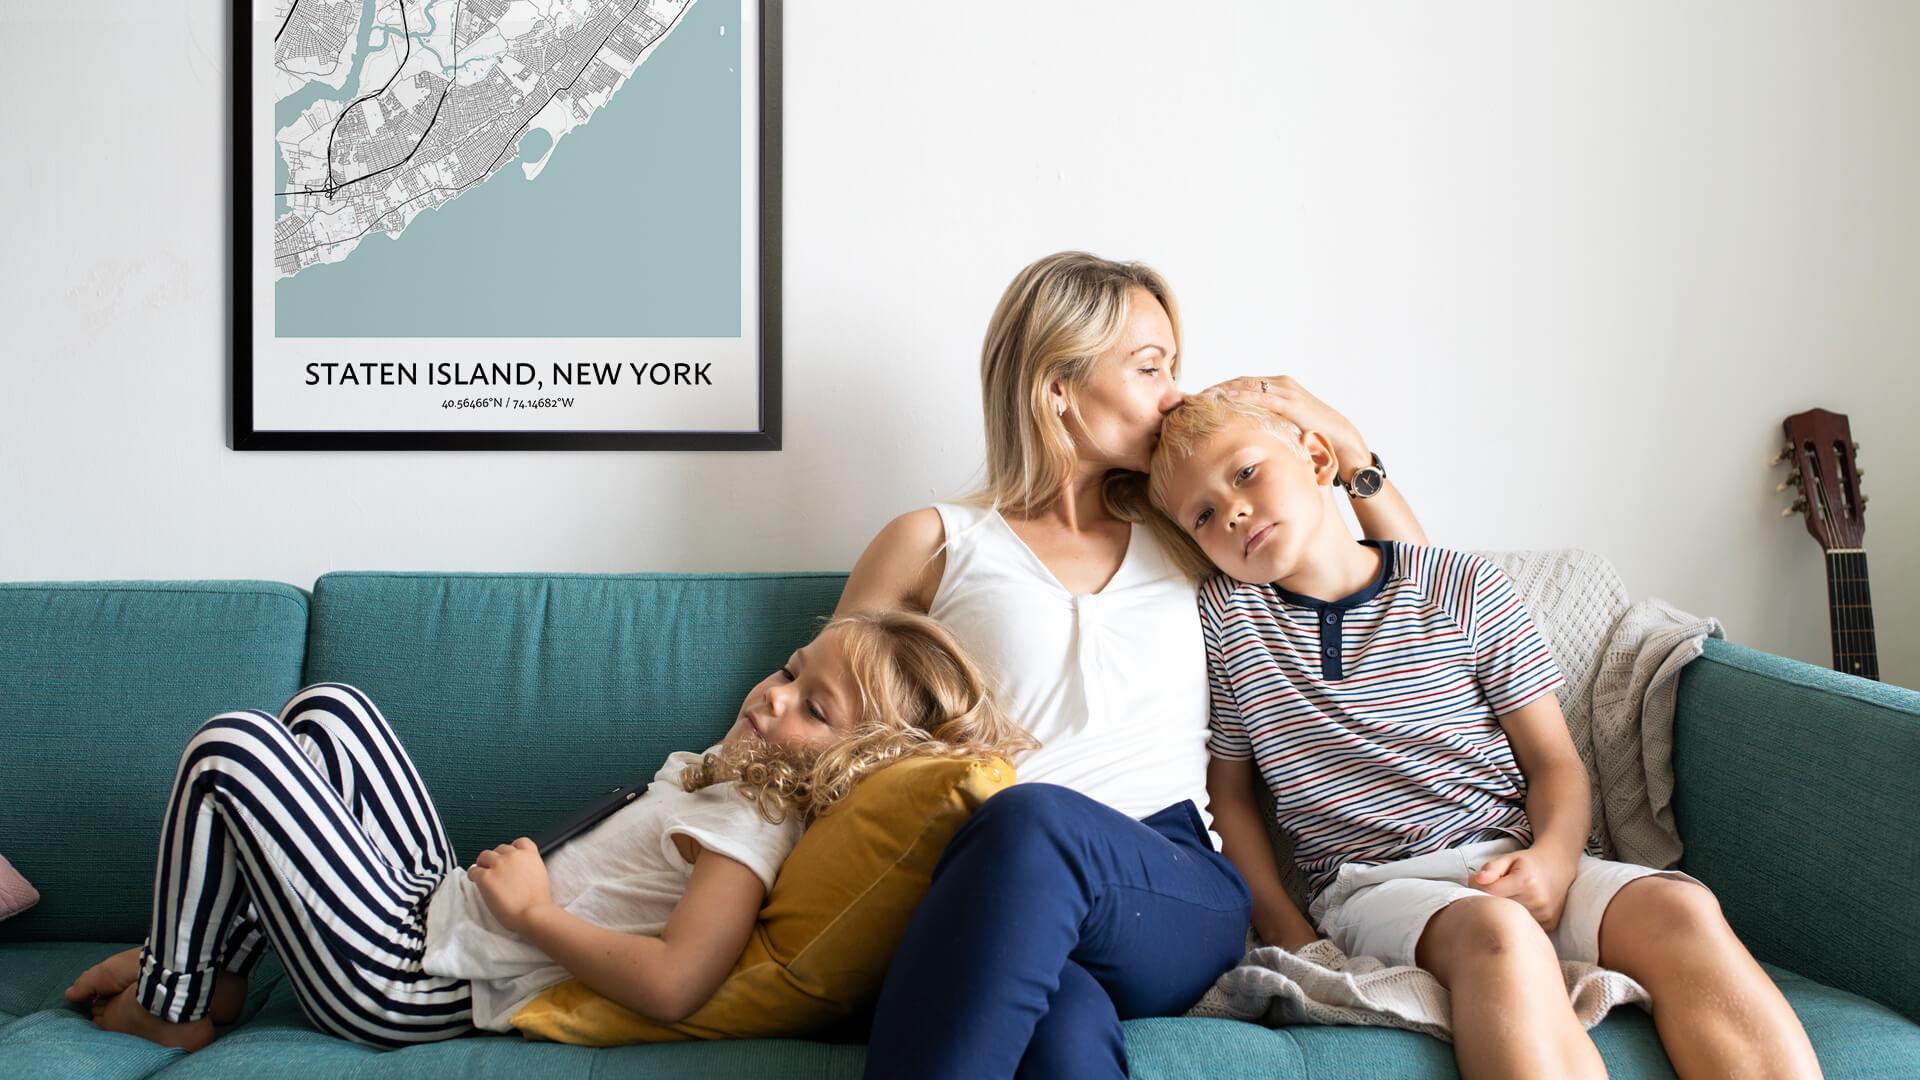 Staten Island map poster